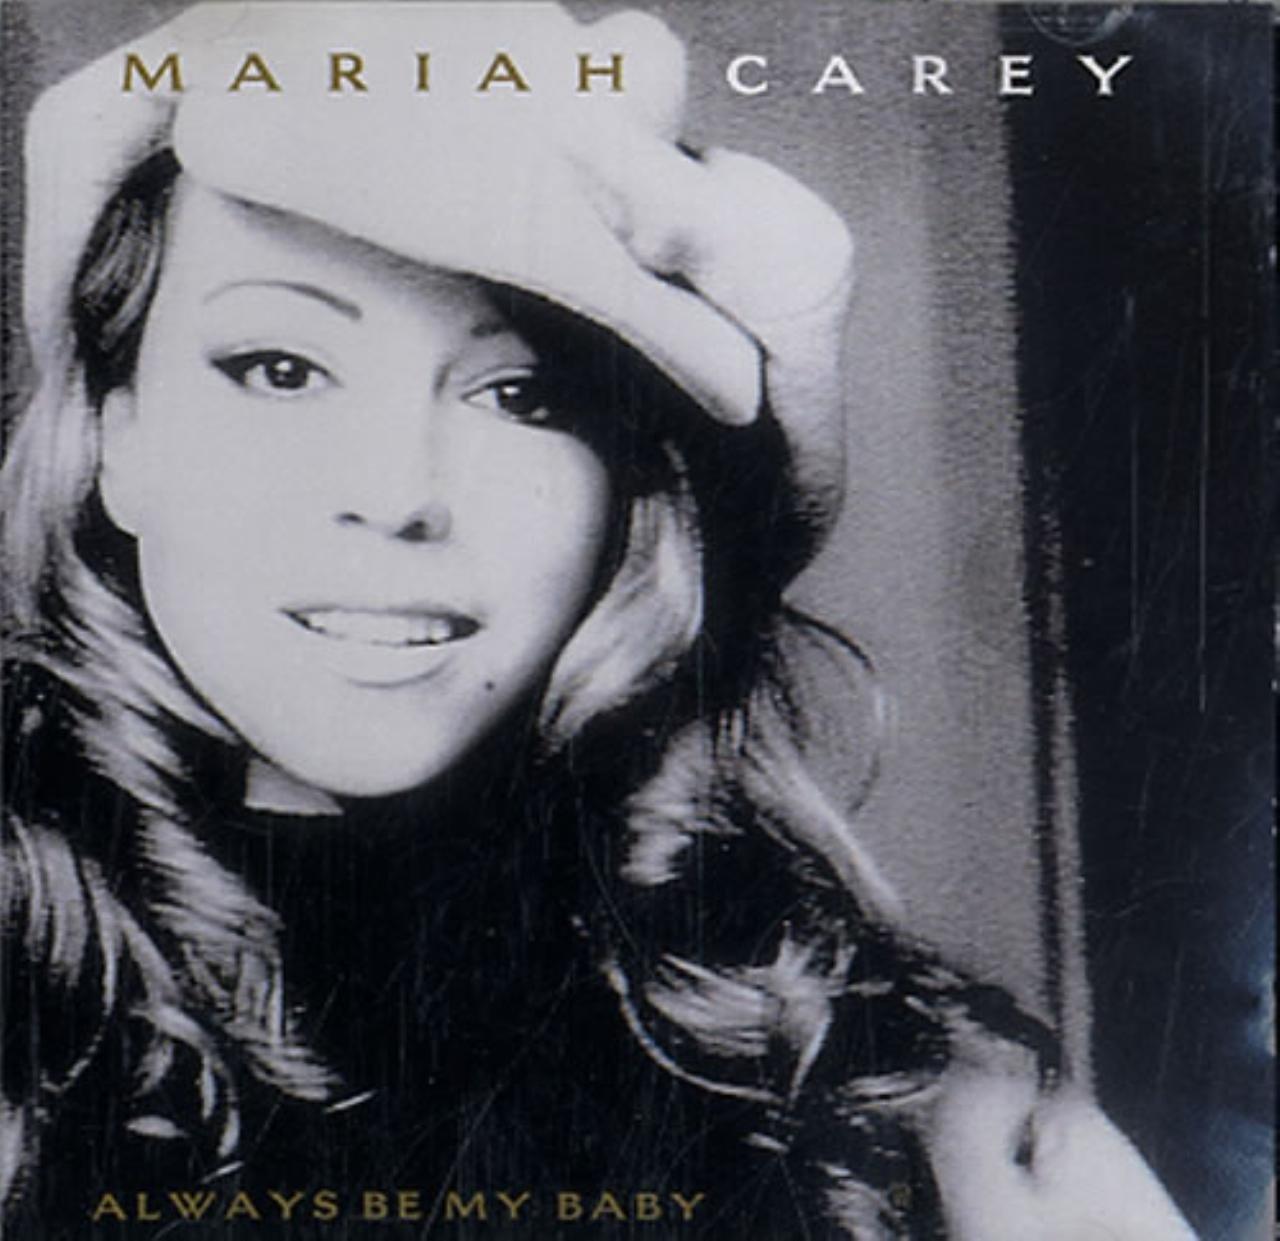 MARIAH CAREY - Always Be My Baby - CD